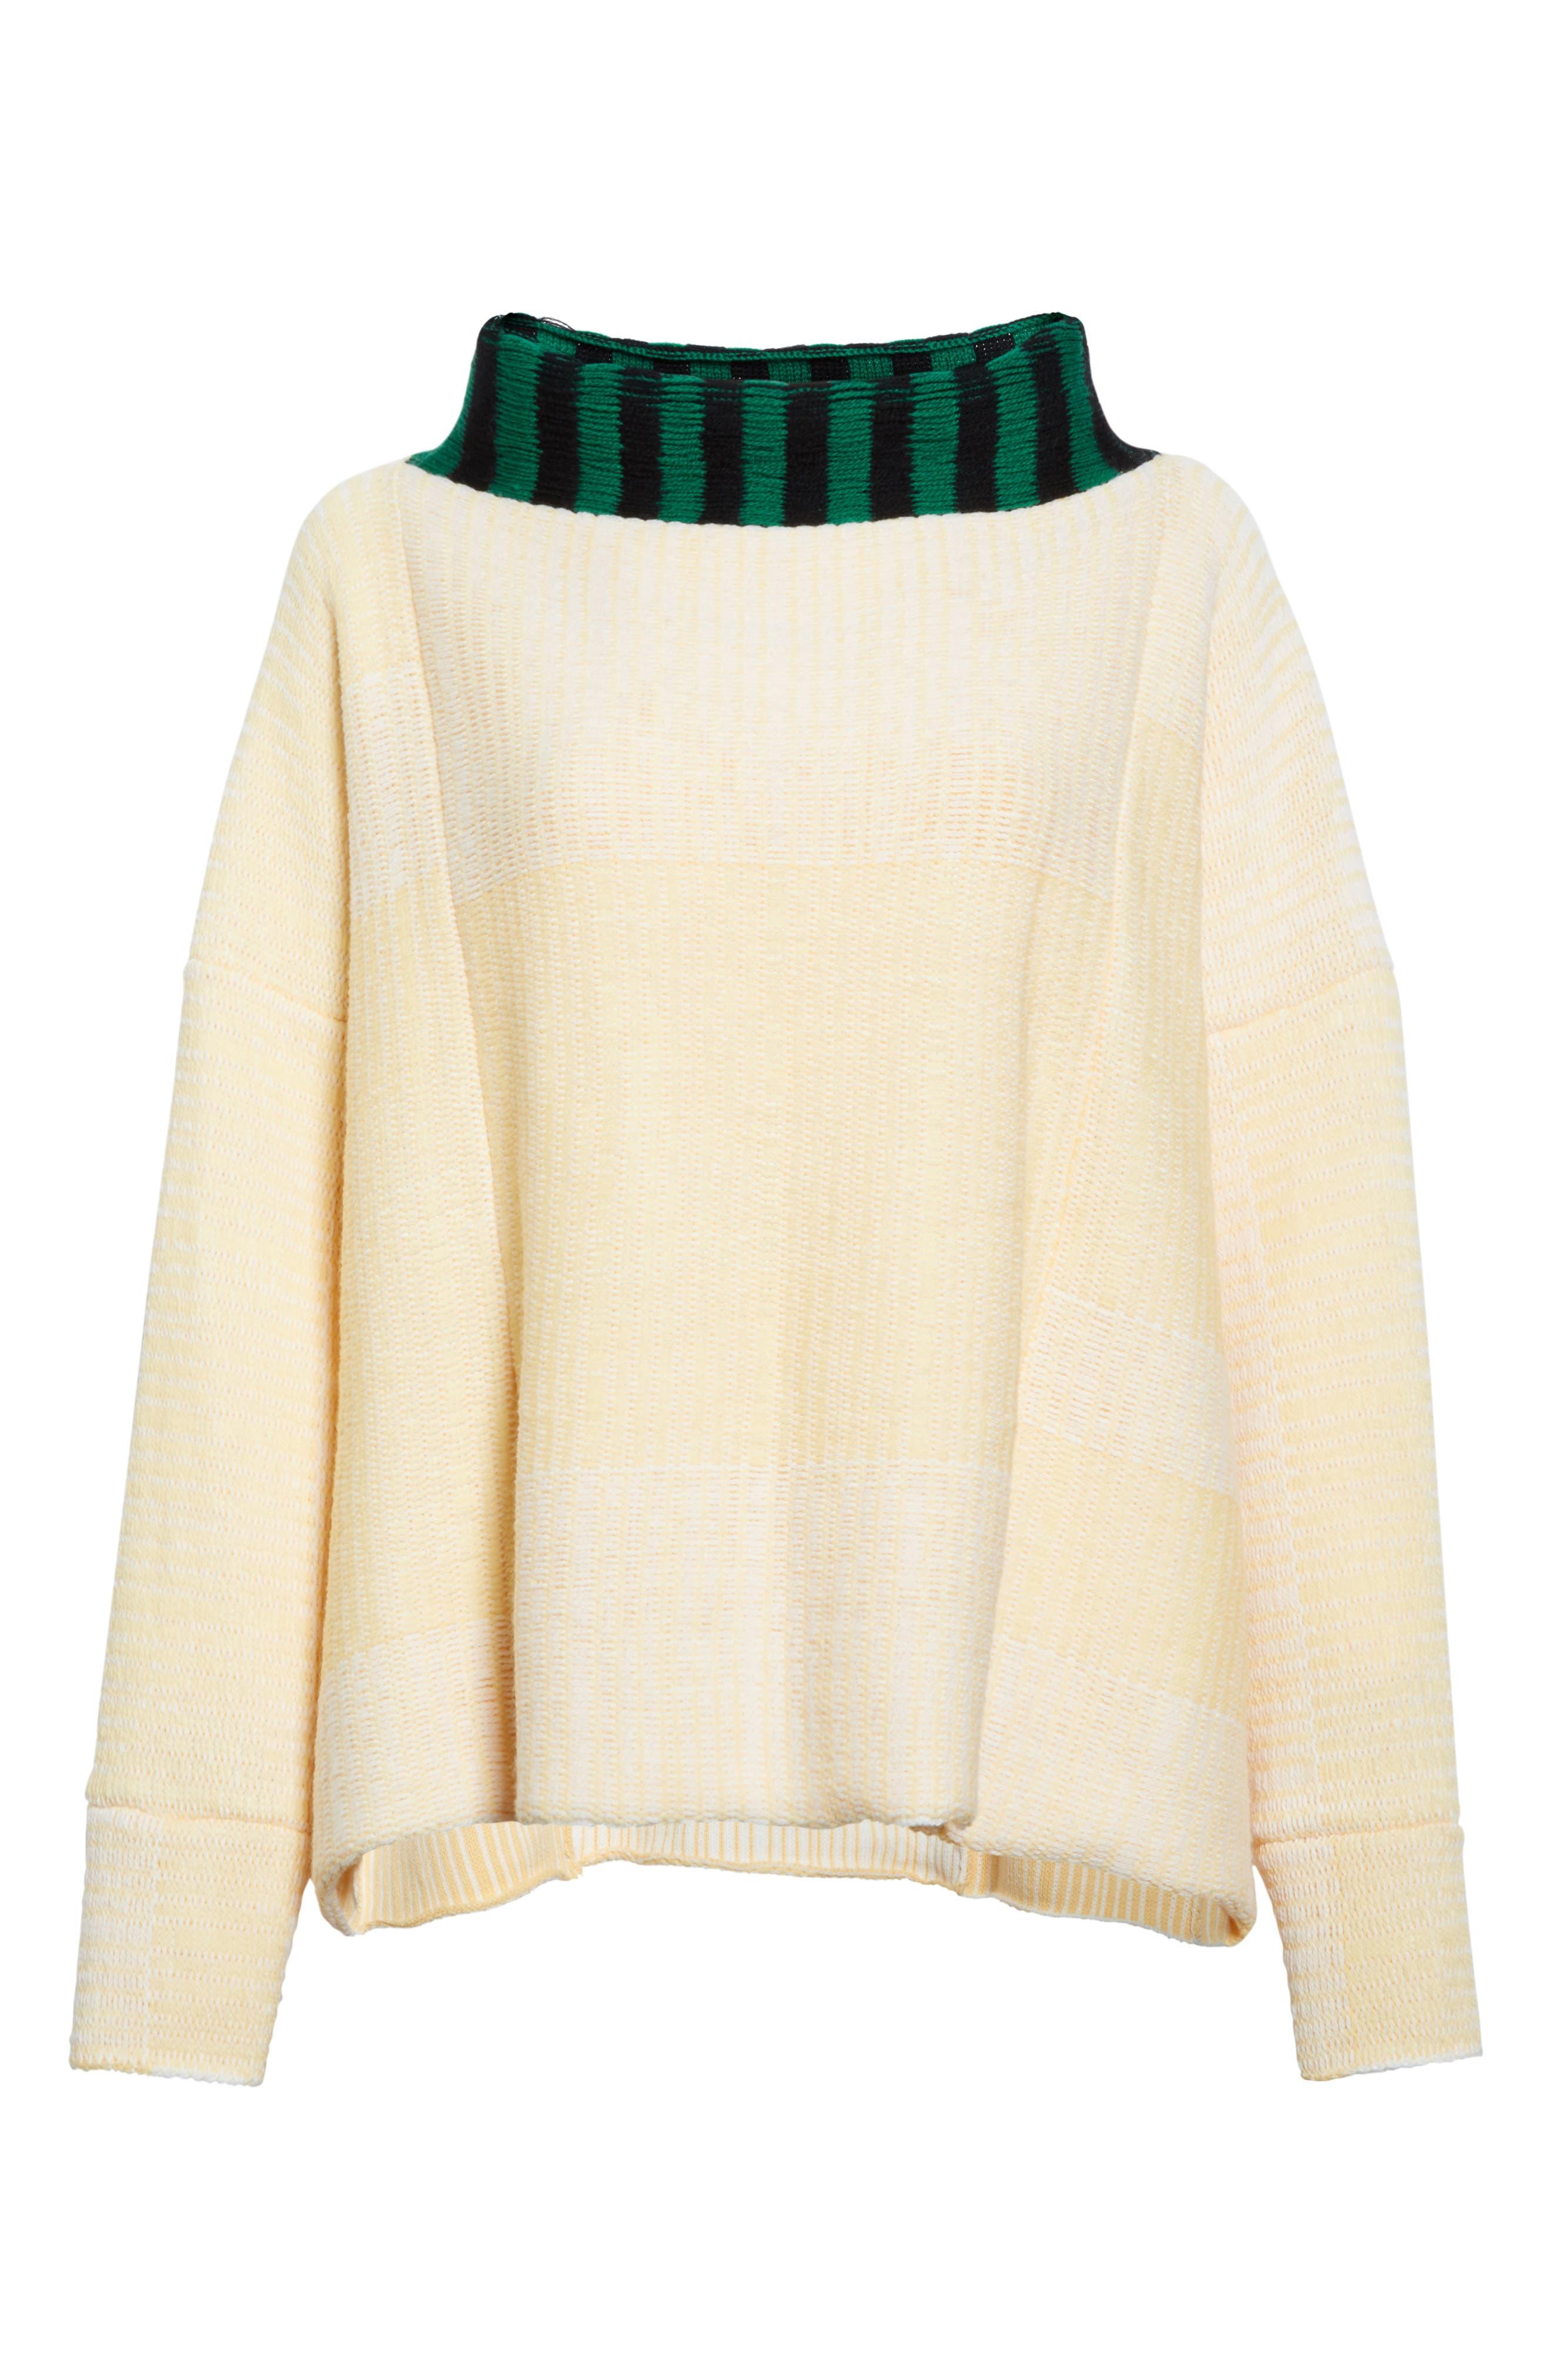 Vented Dolman Sweater,                             Alternate thumbnail 4, color,                             Chamois